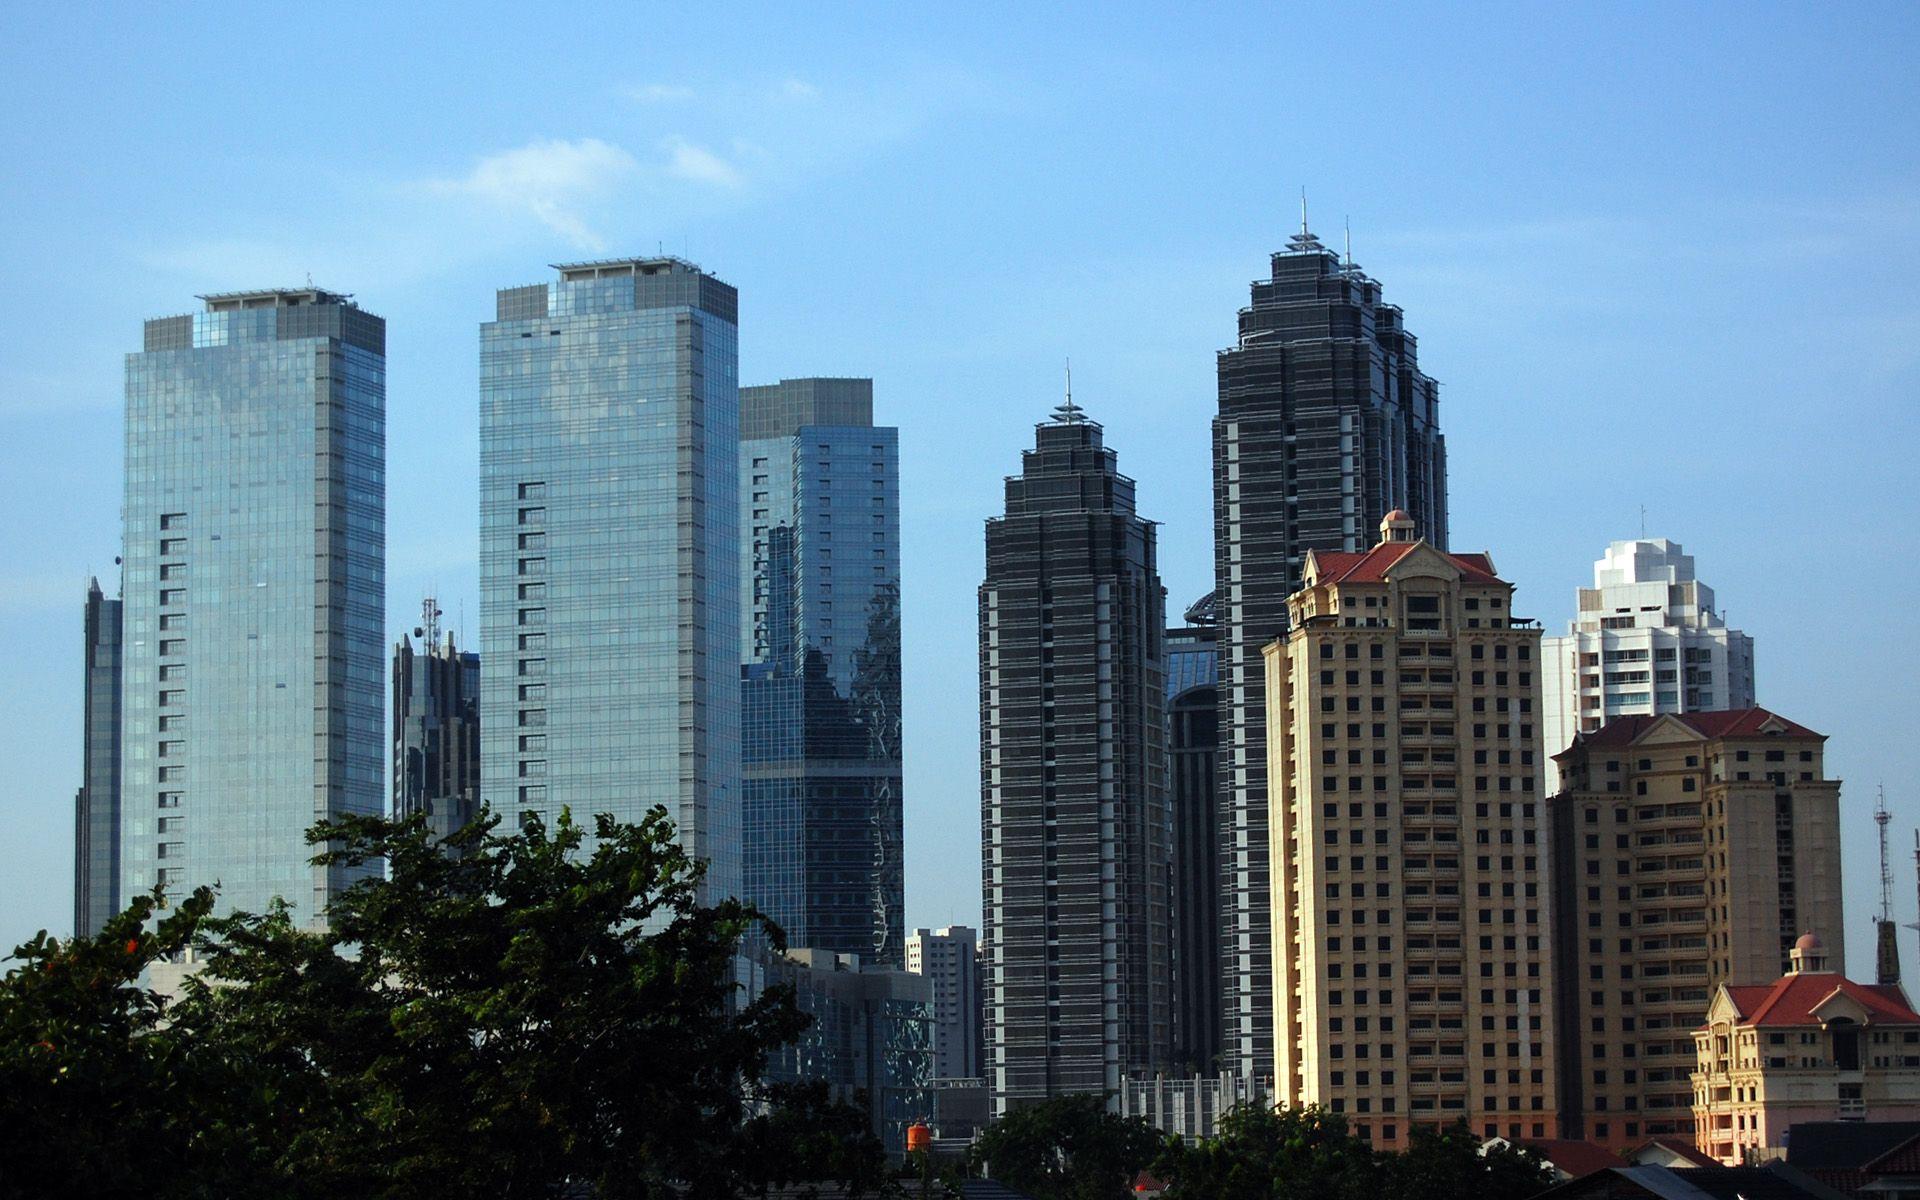 Skyscrapers Jakarta Skyscrapers, Indonesia Globe